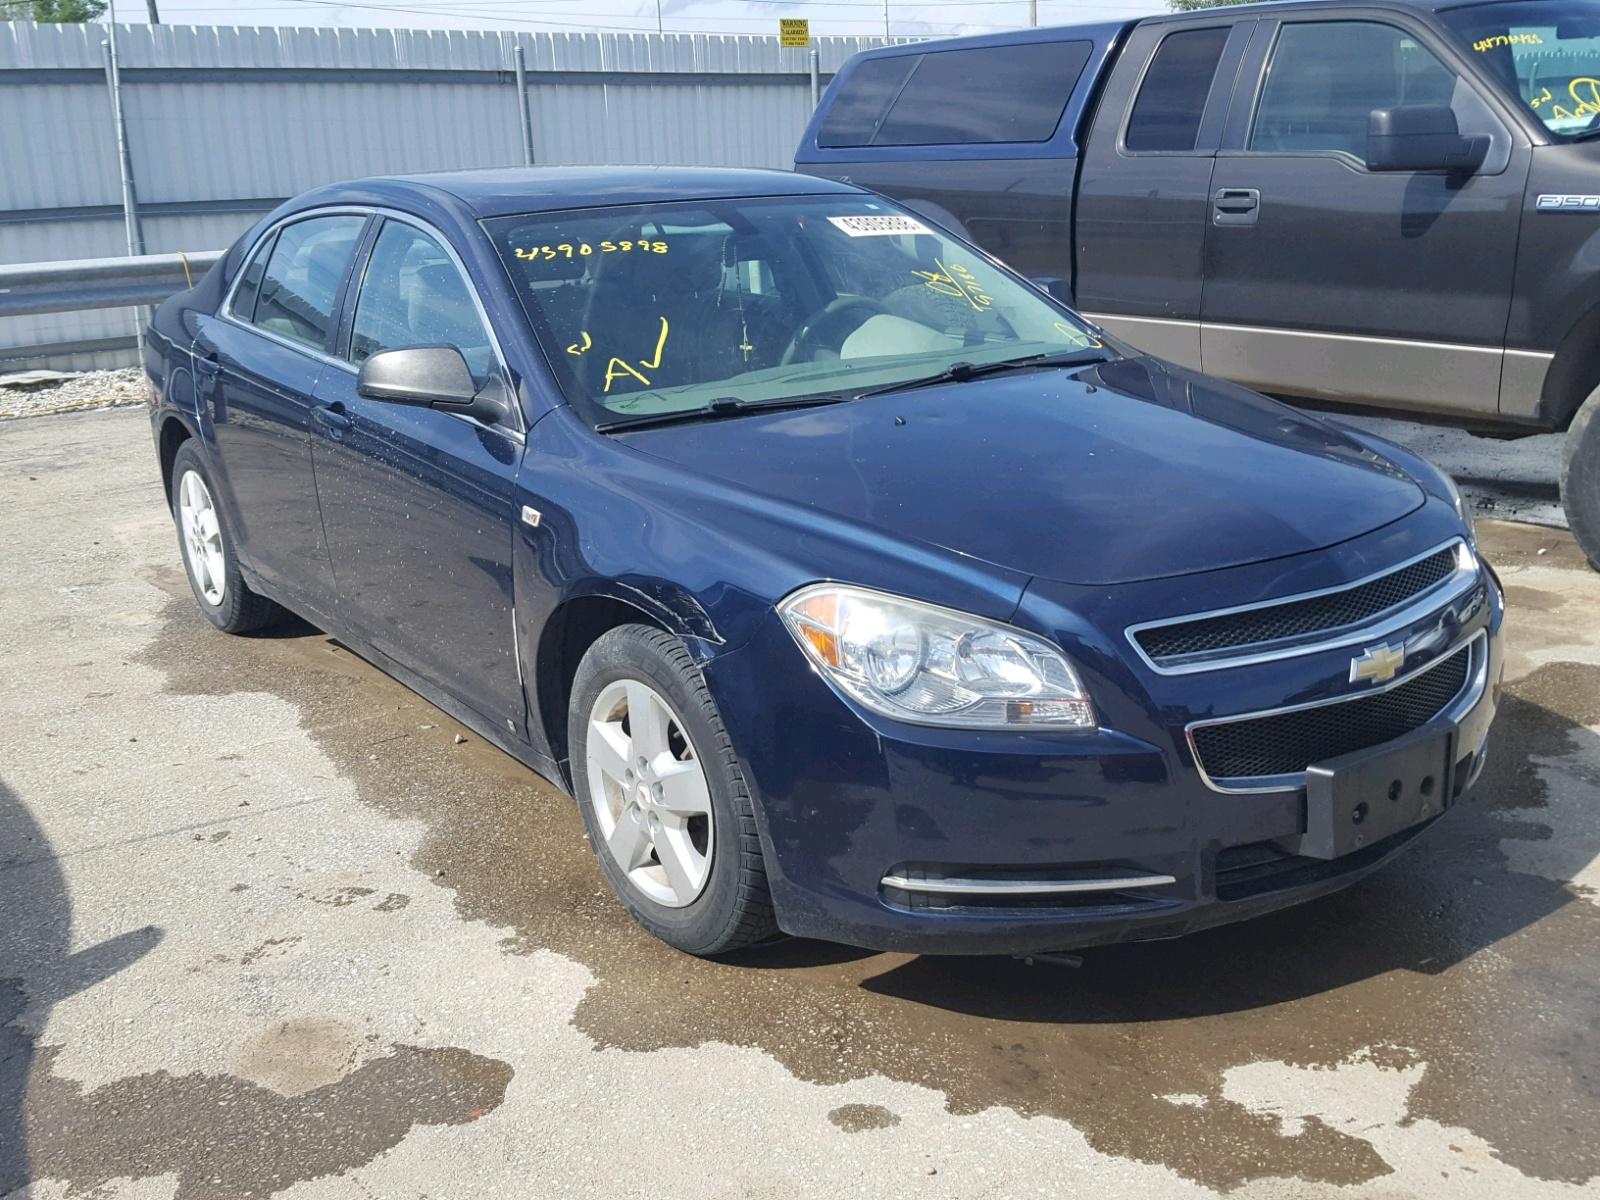 Auto Auction Ended on VIN 1G1ZG57B 2008 Chevrolet Malibu